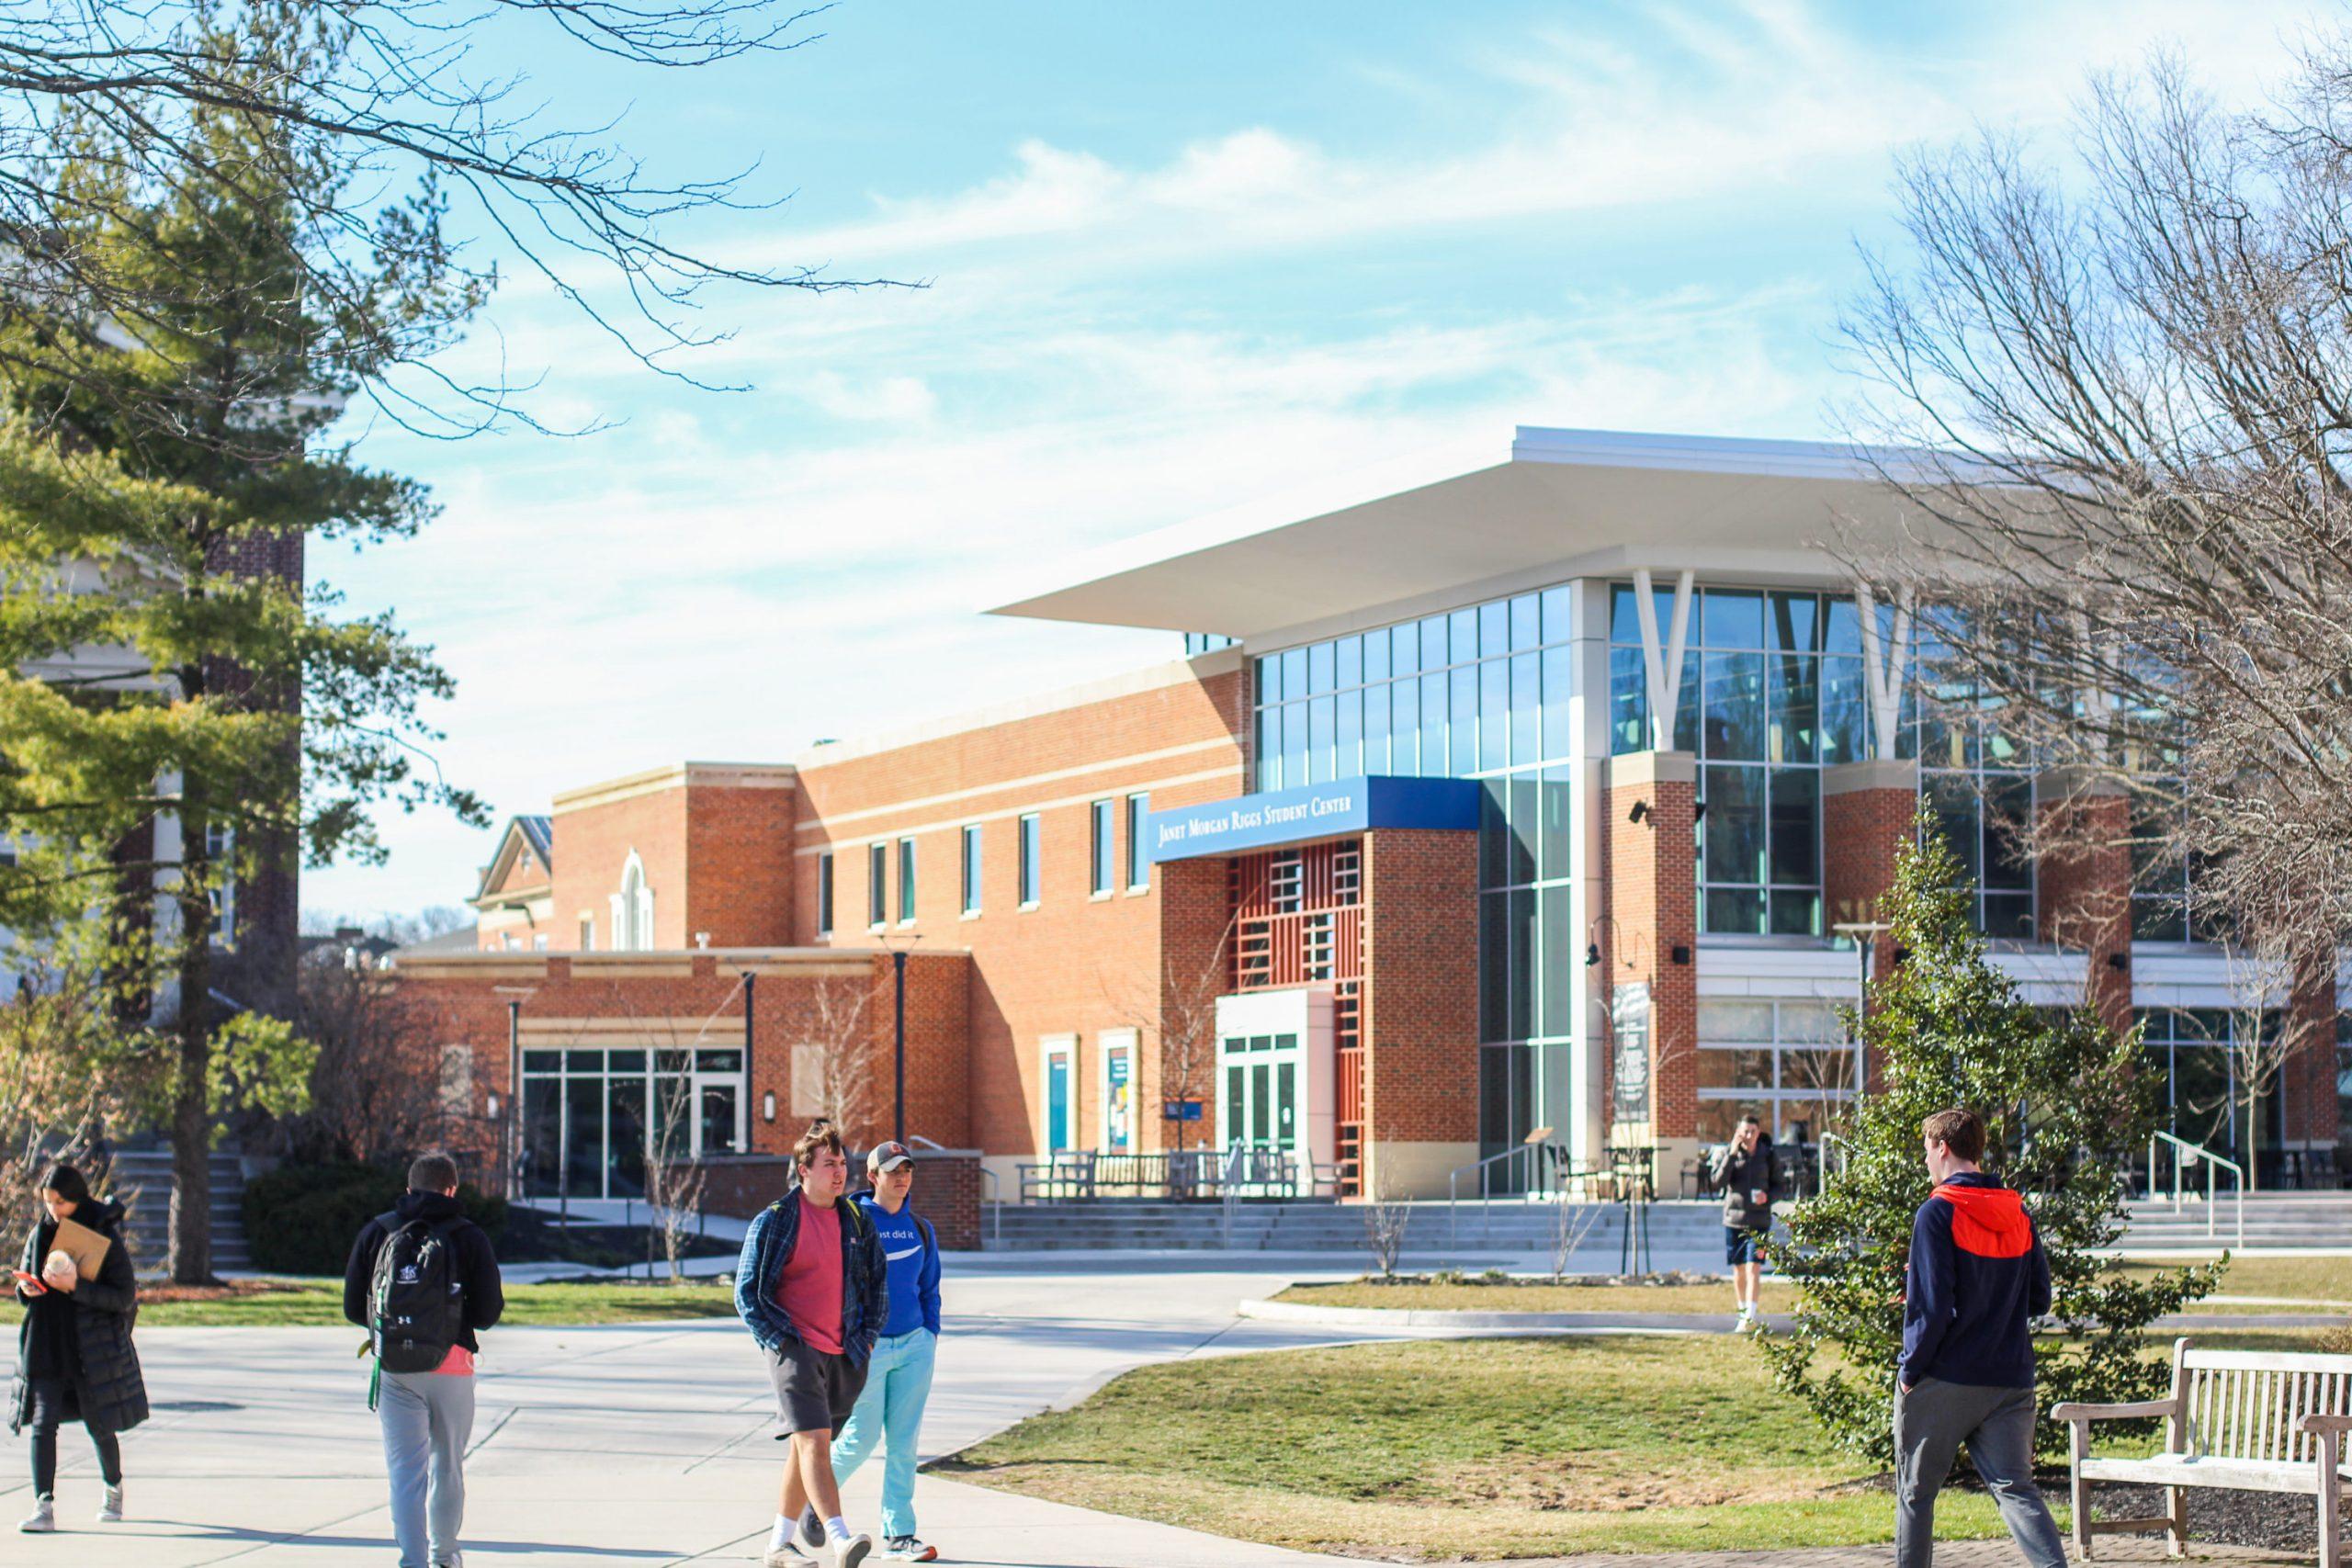 College Will Extend Spring Breakone Week | The Regarding Cgcc Extending Spring Break